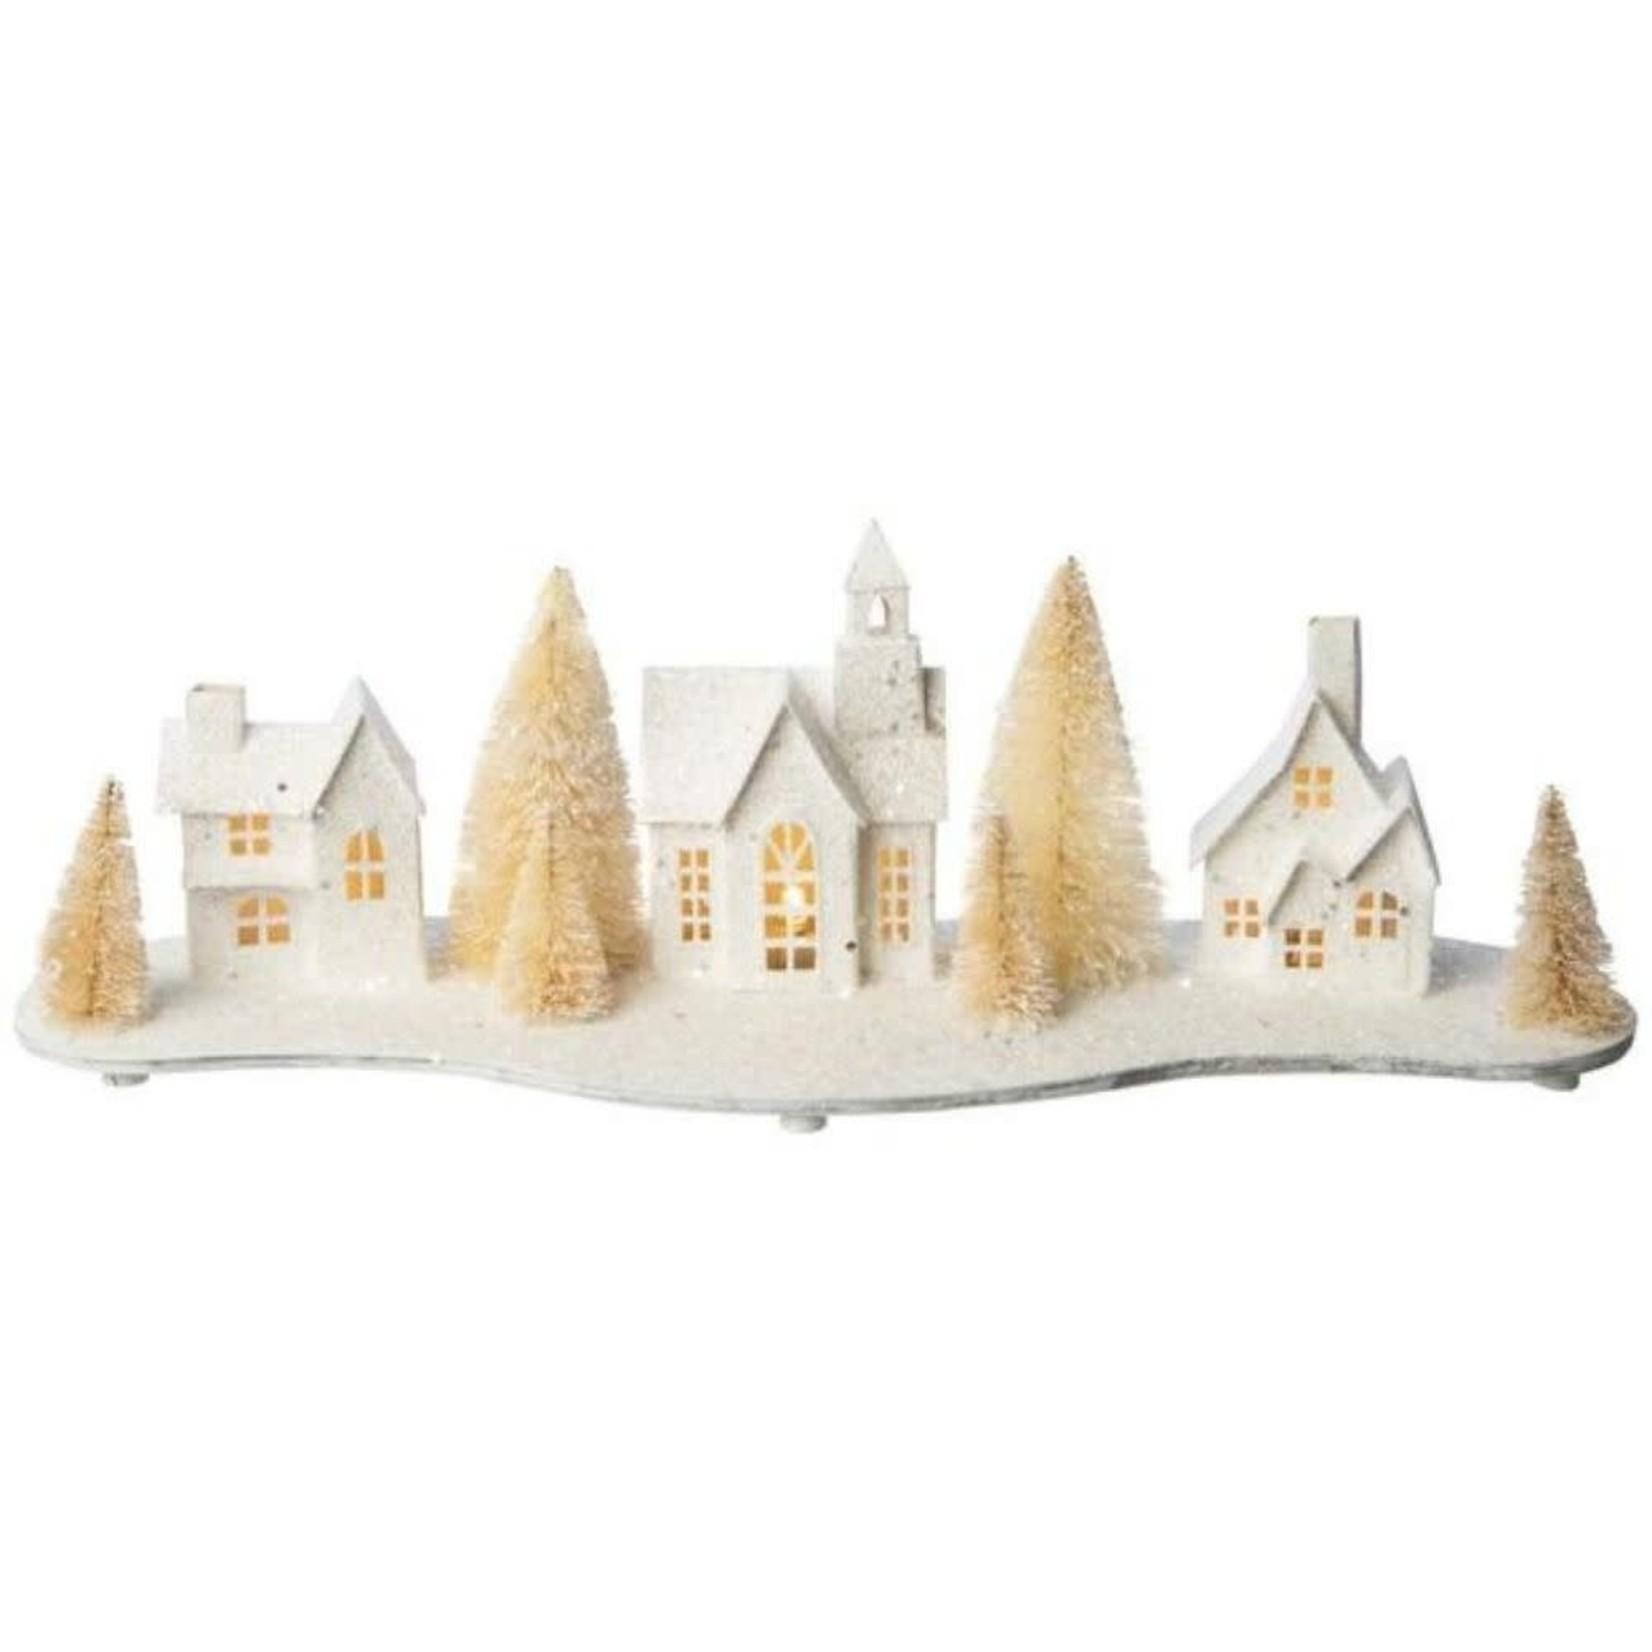 Glittered Paper Village